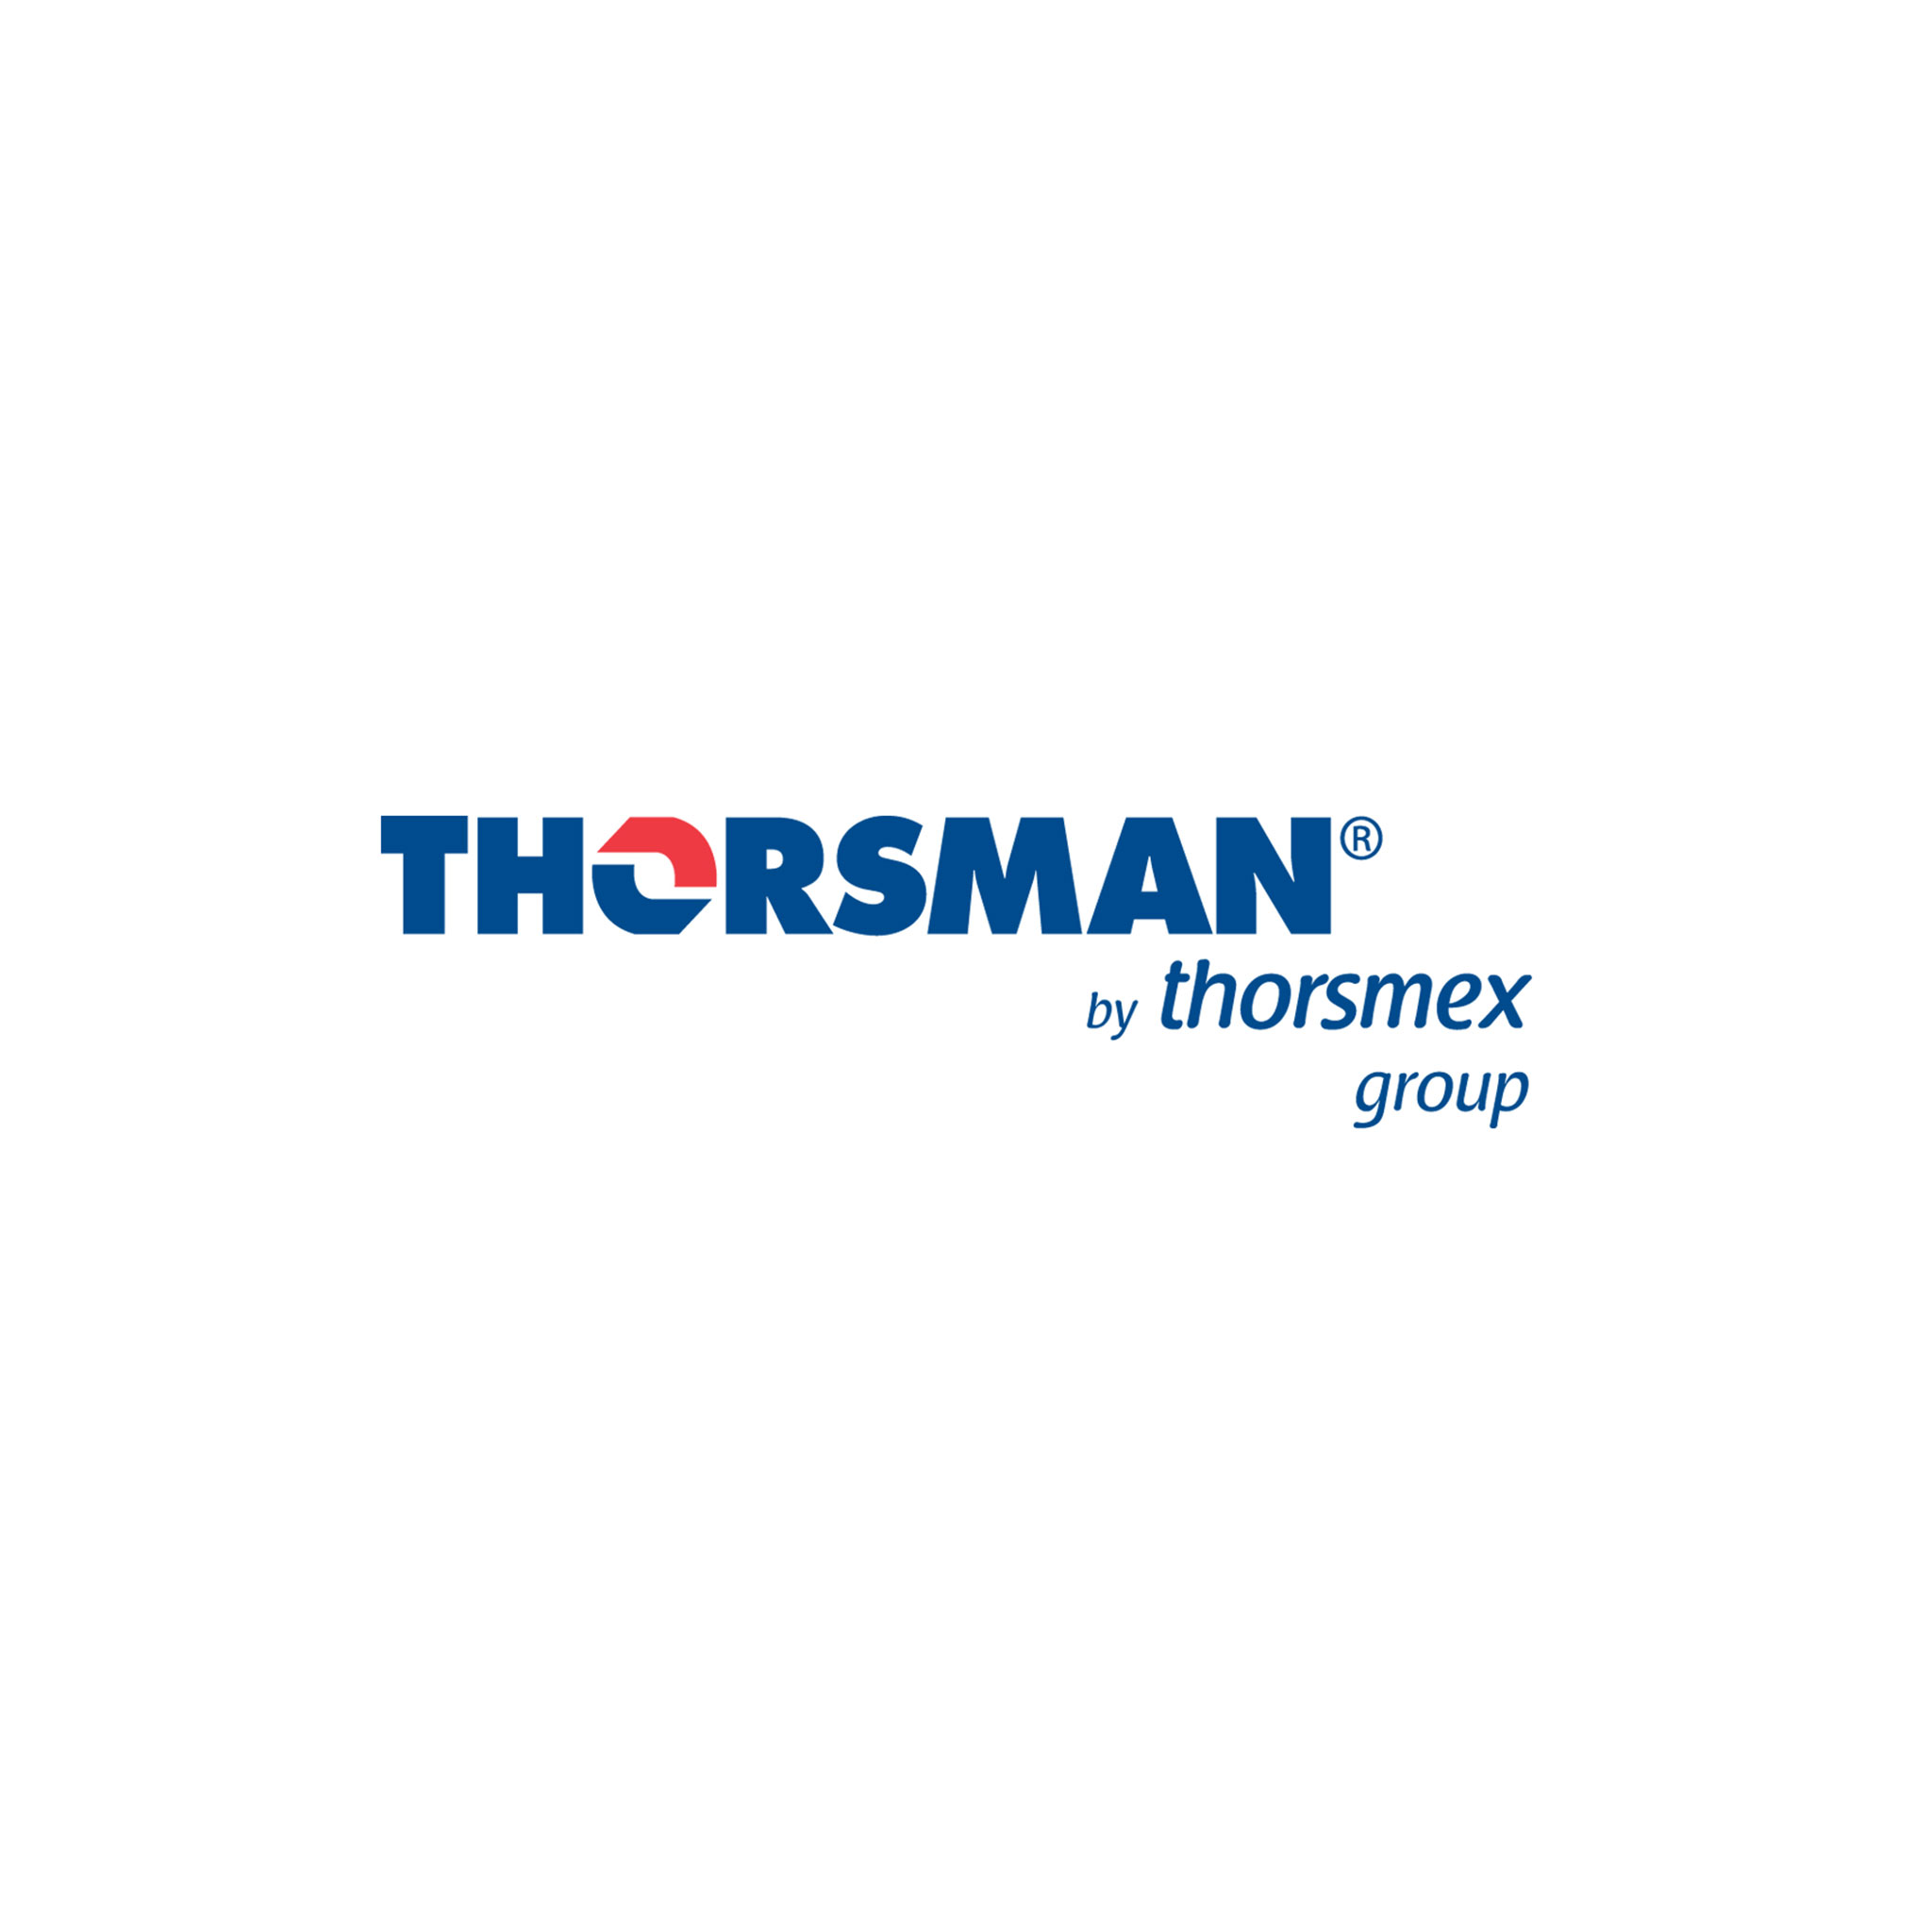 fij_thorsman